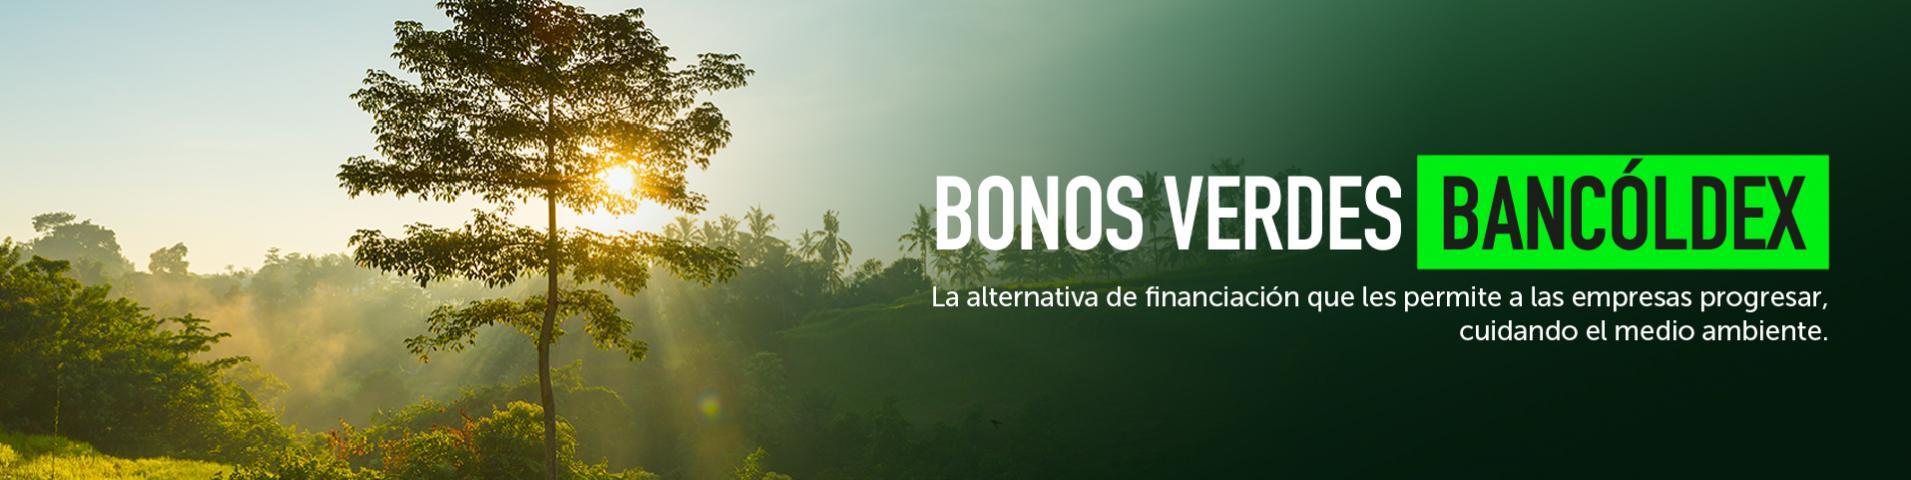 bonos_verdes